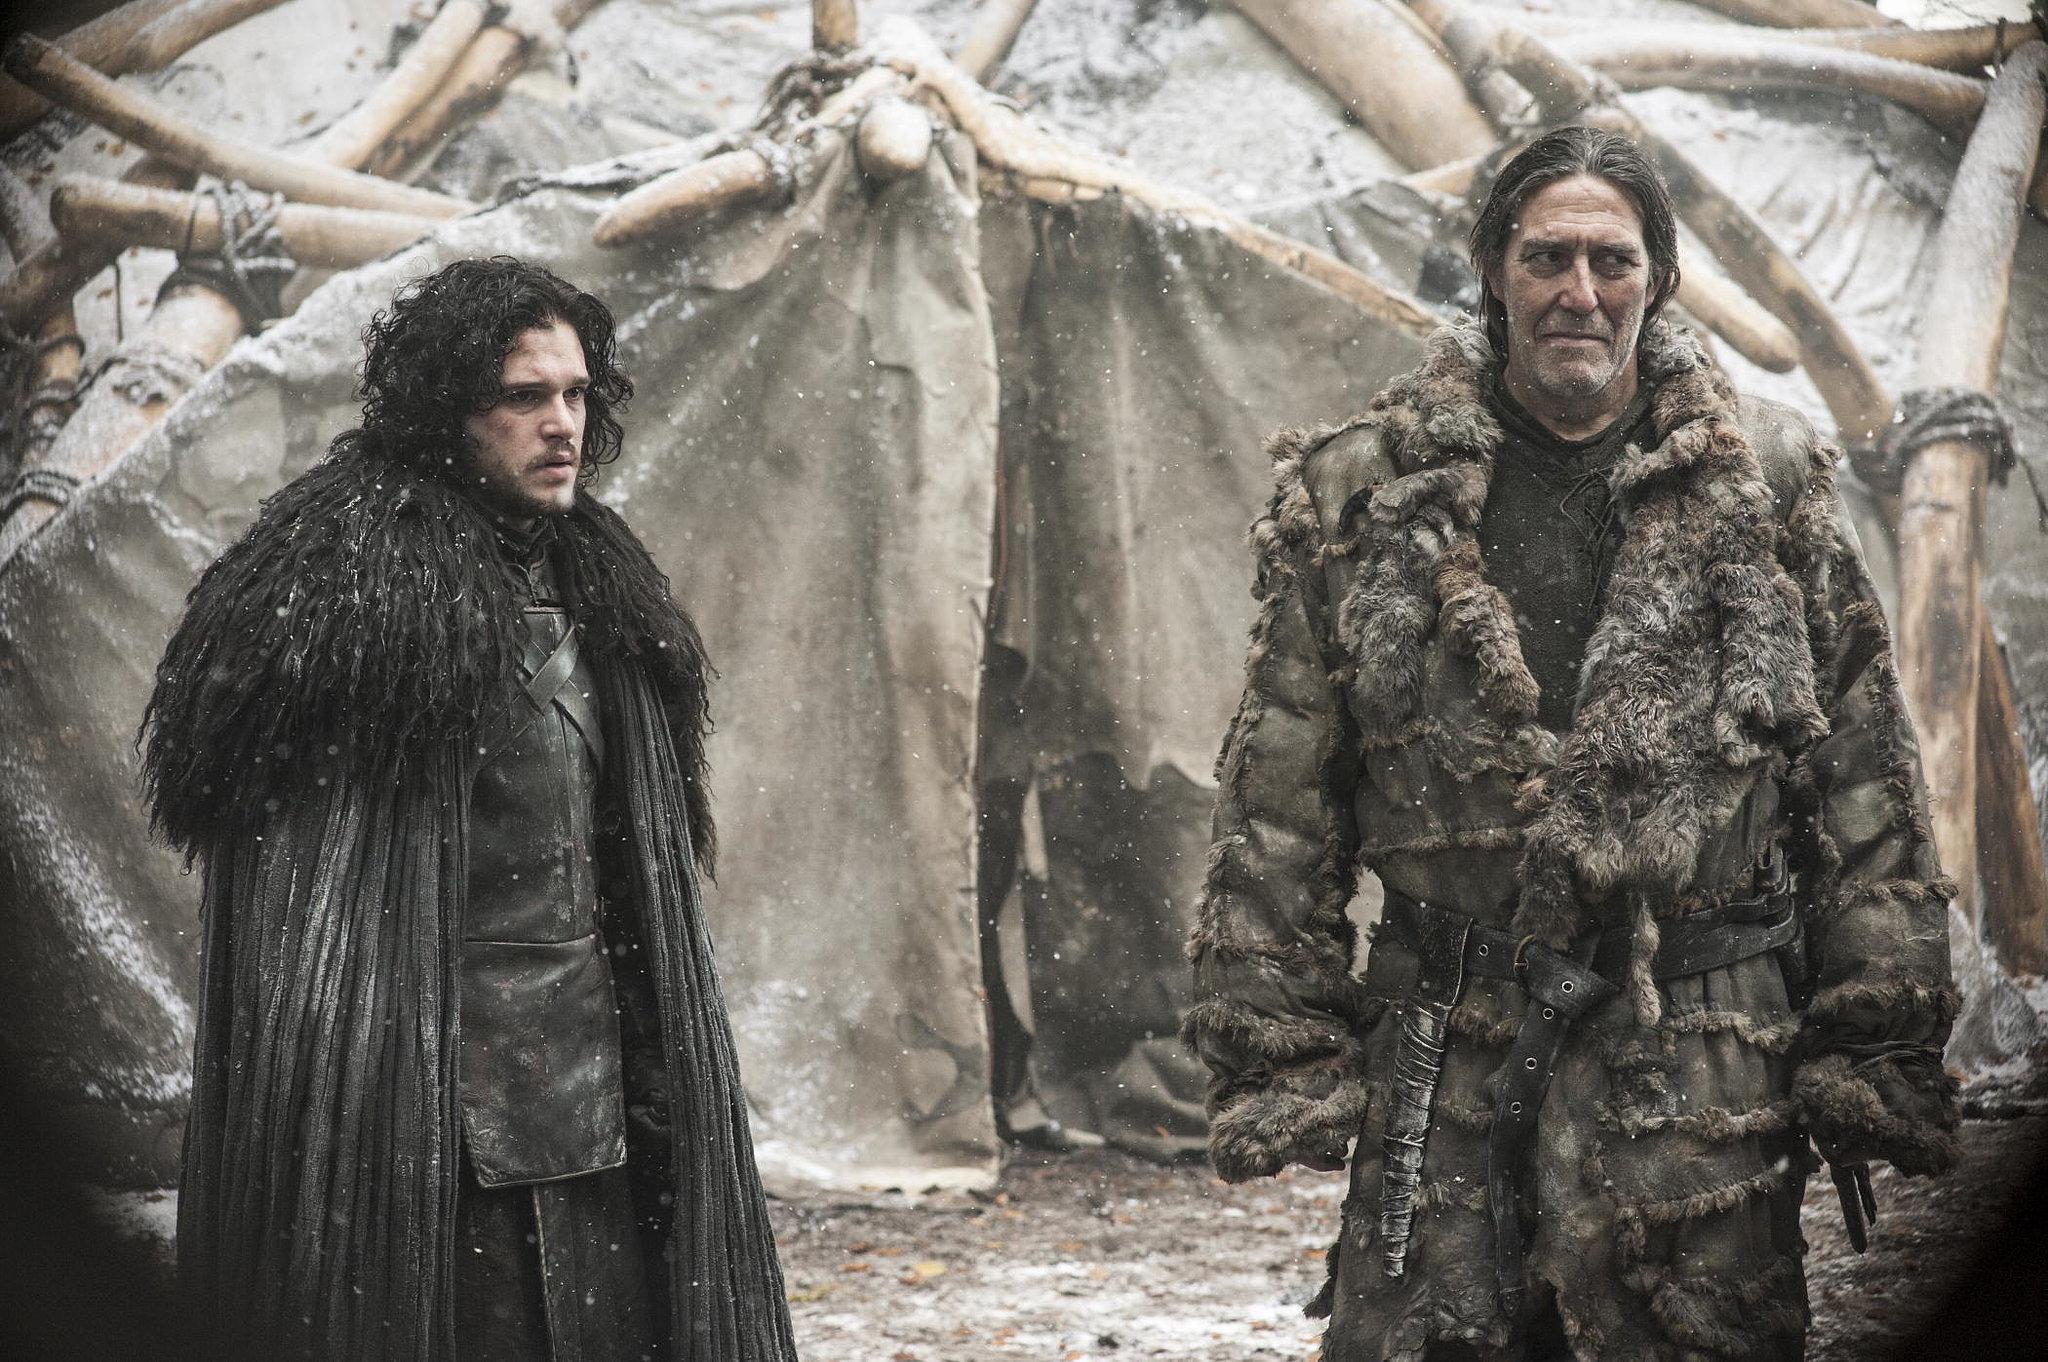 Game of thrones season 5 start date